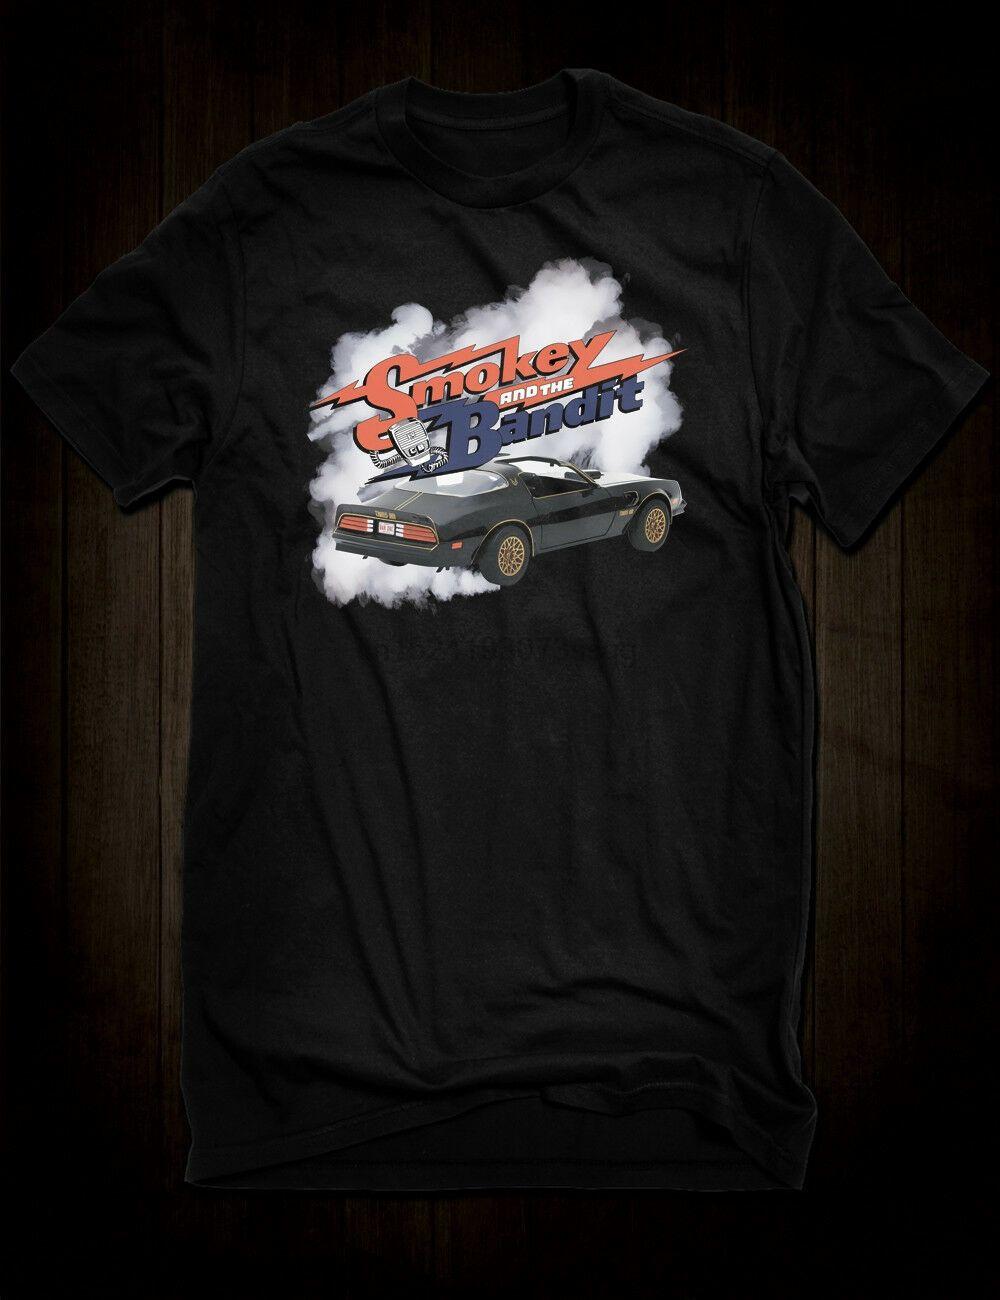 Nueva Negro Smokey and the Bandit Trans Am camiseta Cult Film Tee Burt Reynolds coche